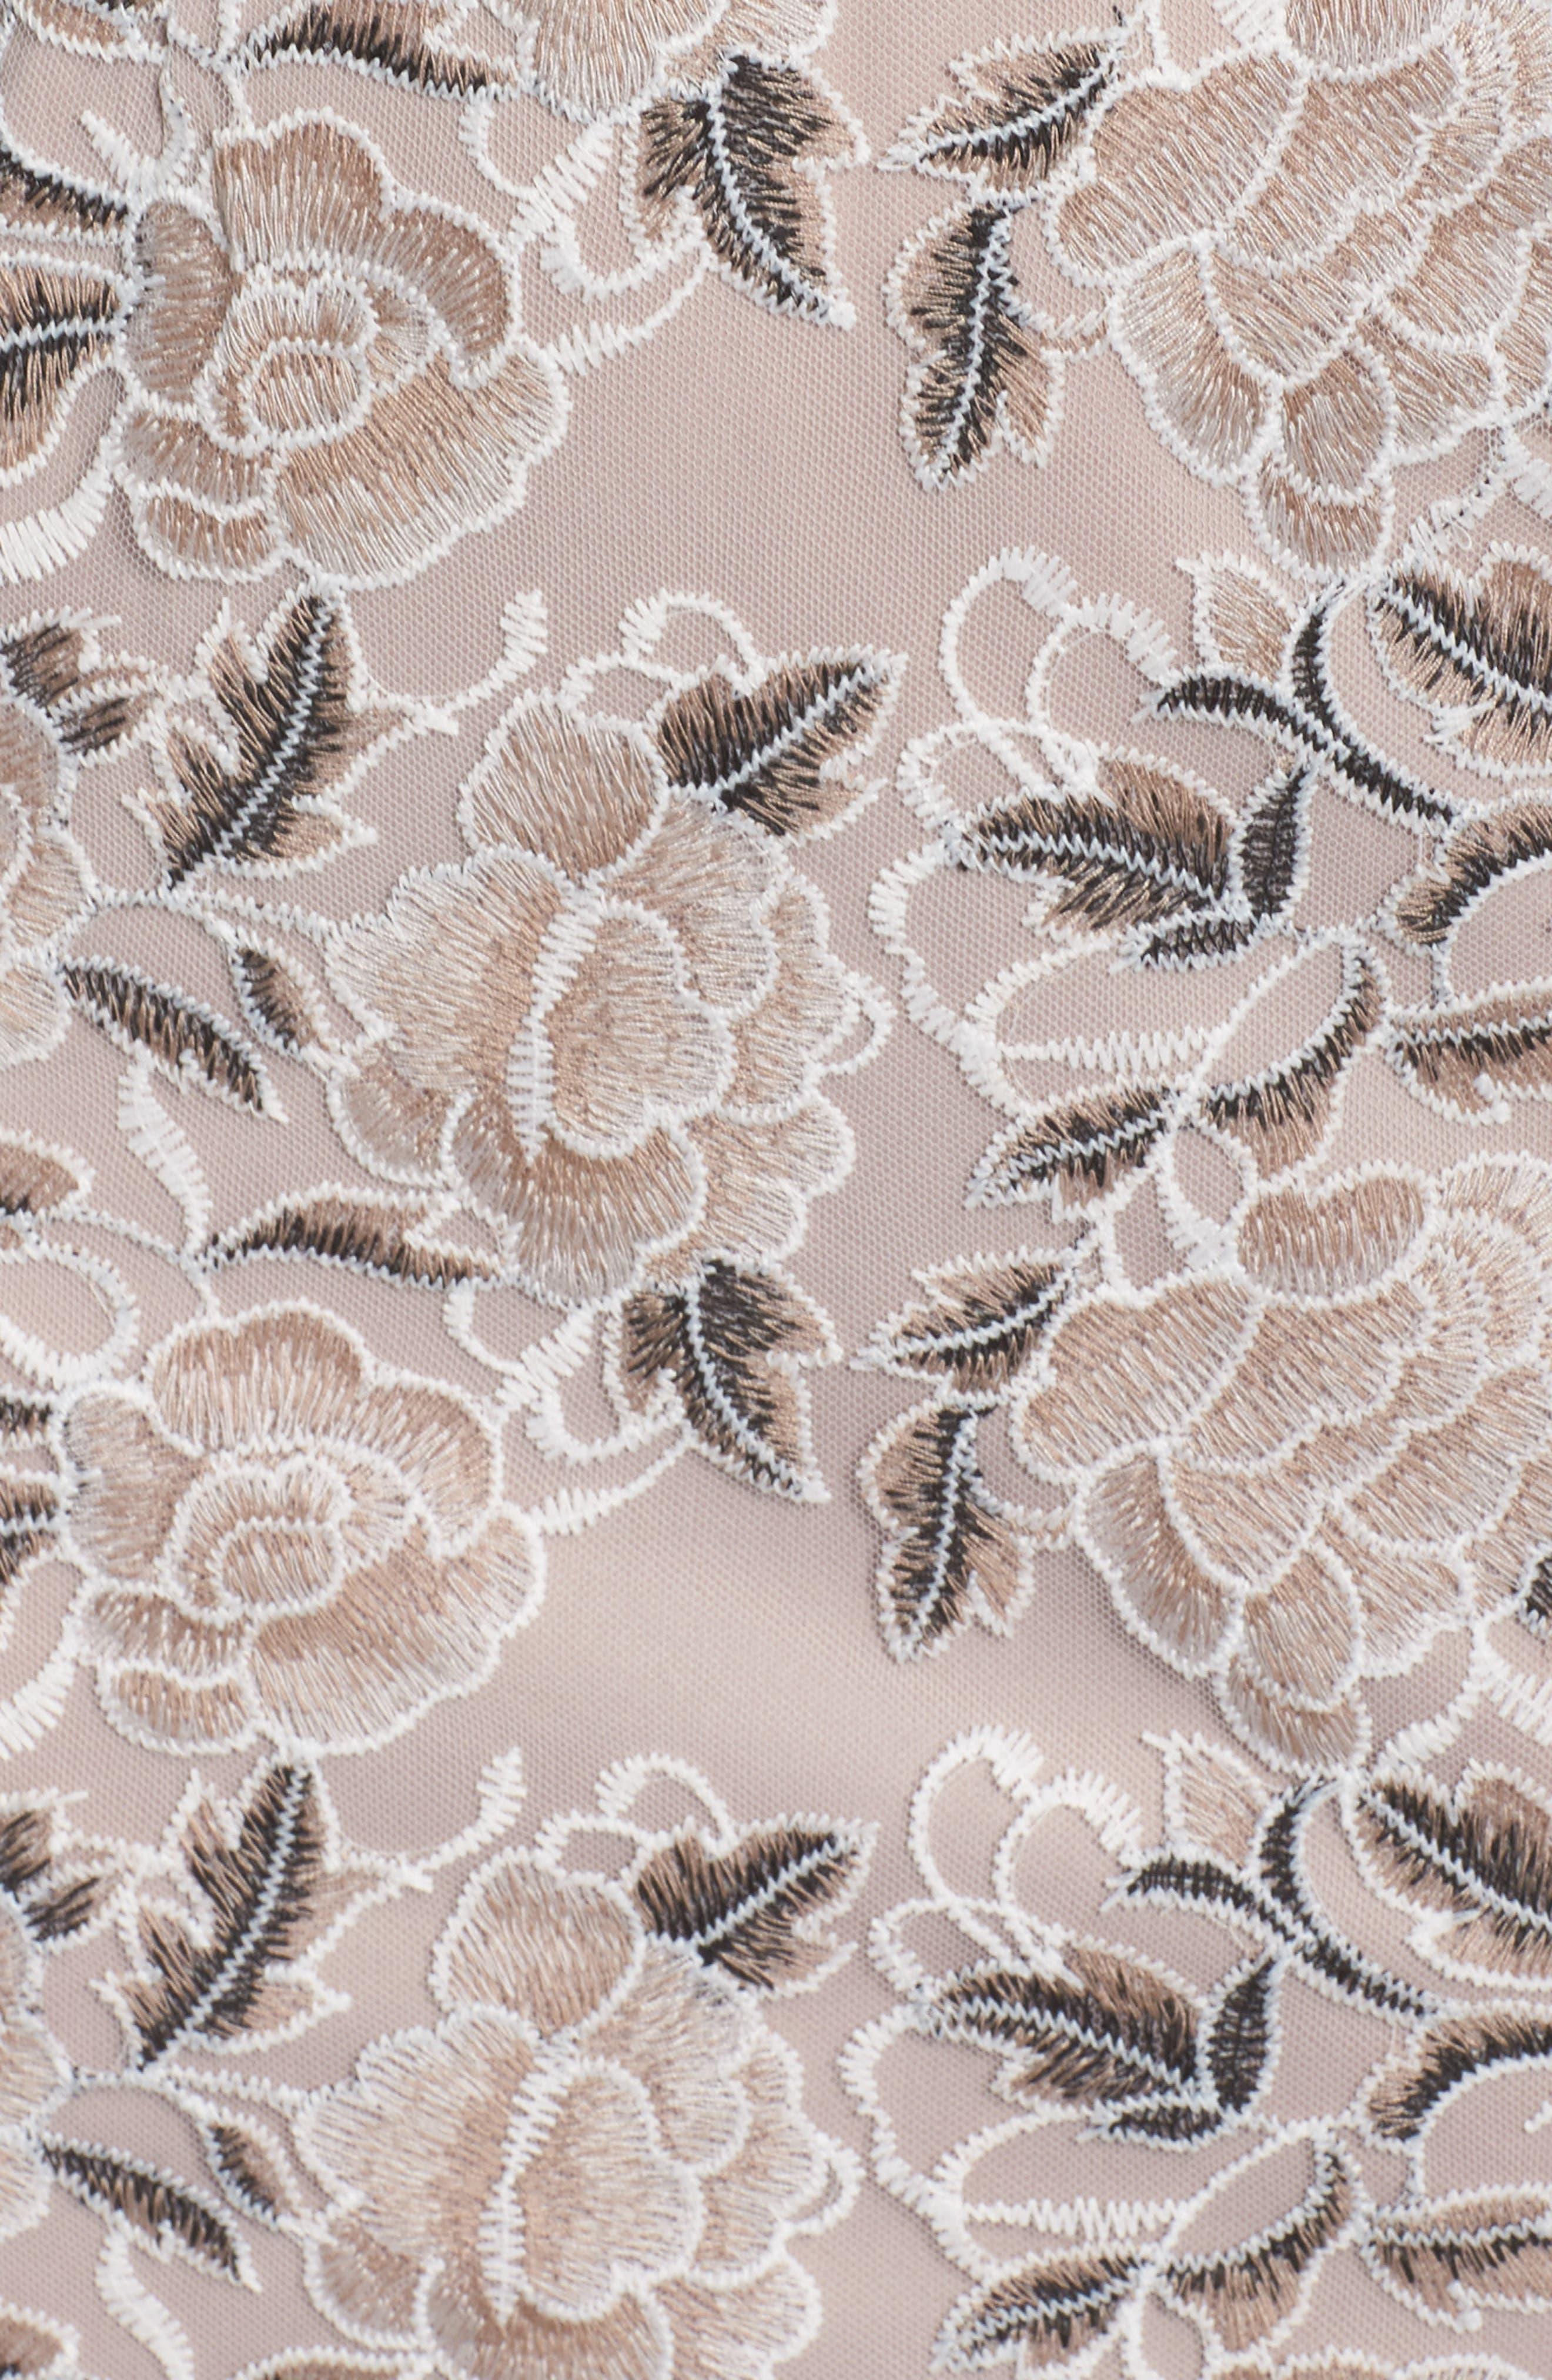 Suzette Embroidered Sheath Dress,                             Alternate thumbnail 5, color,